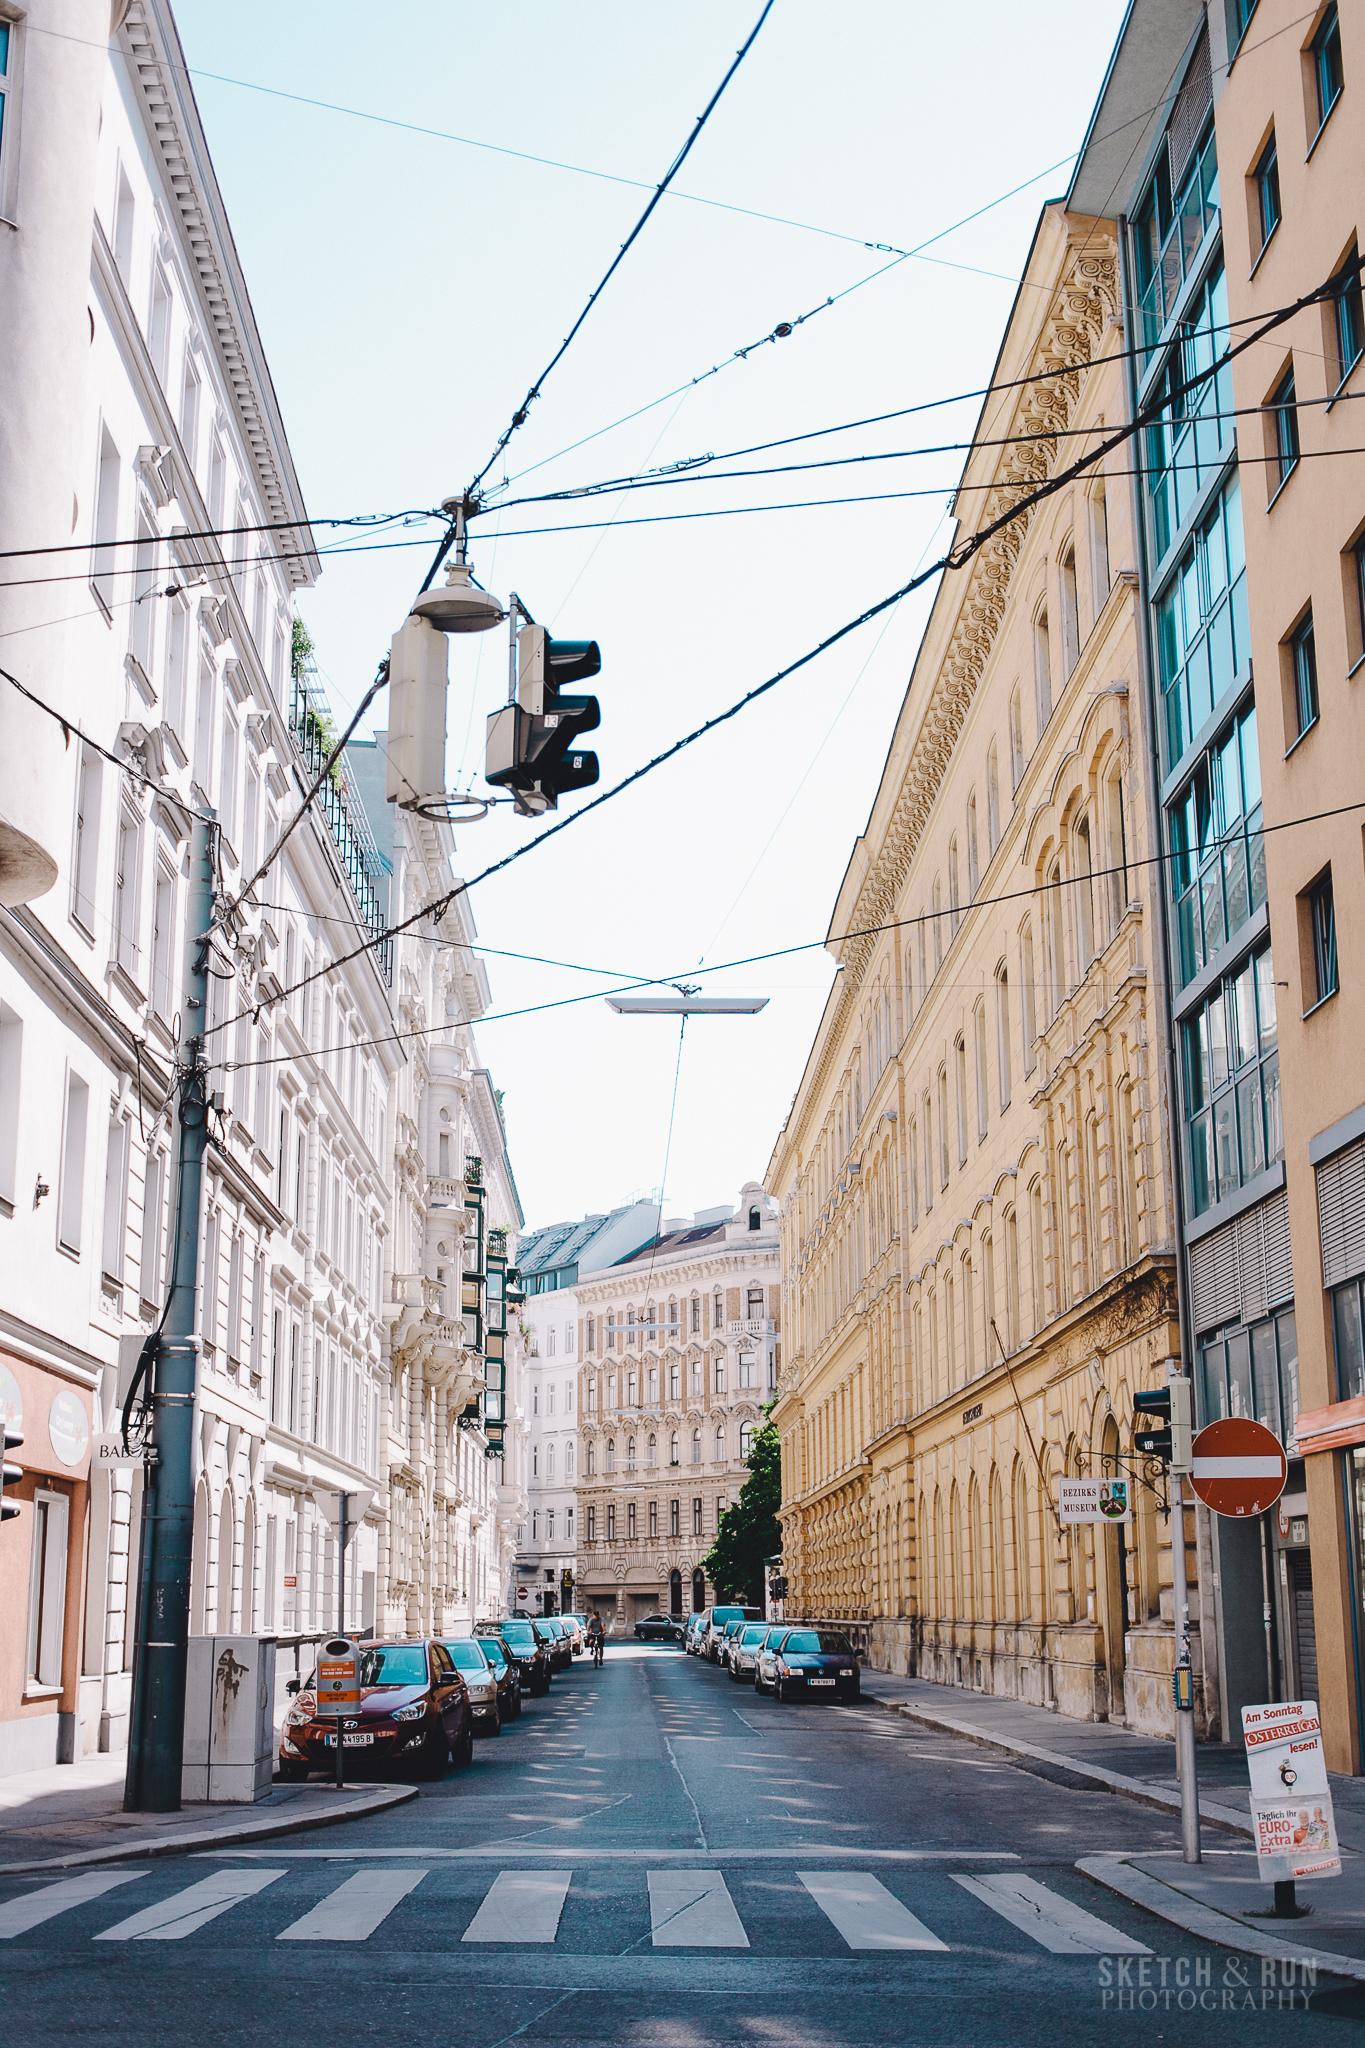 Vienna, Austria, street photography, traffic lights